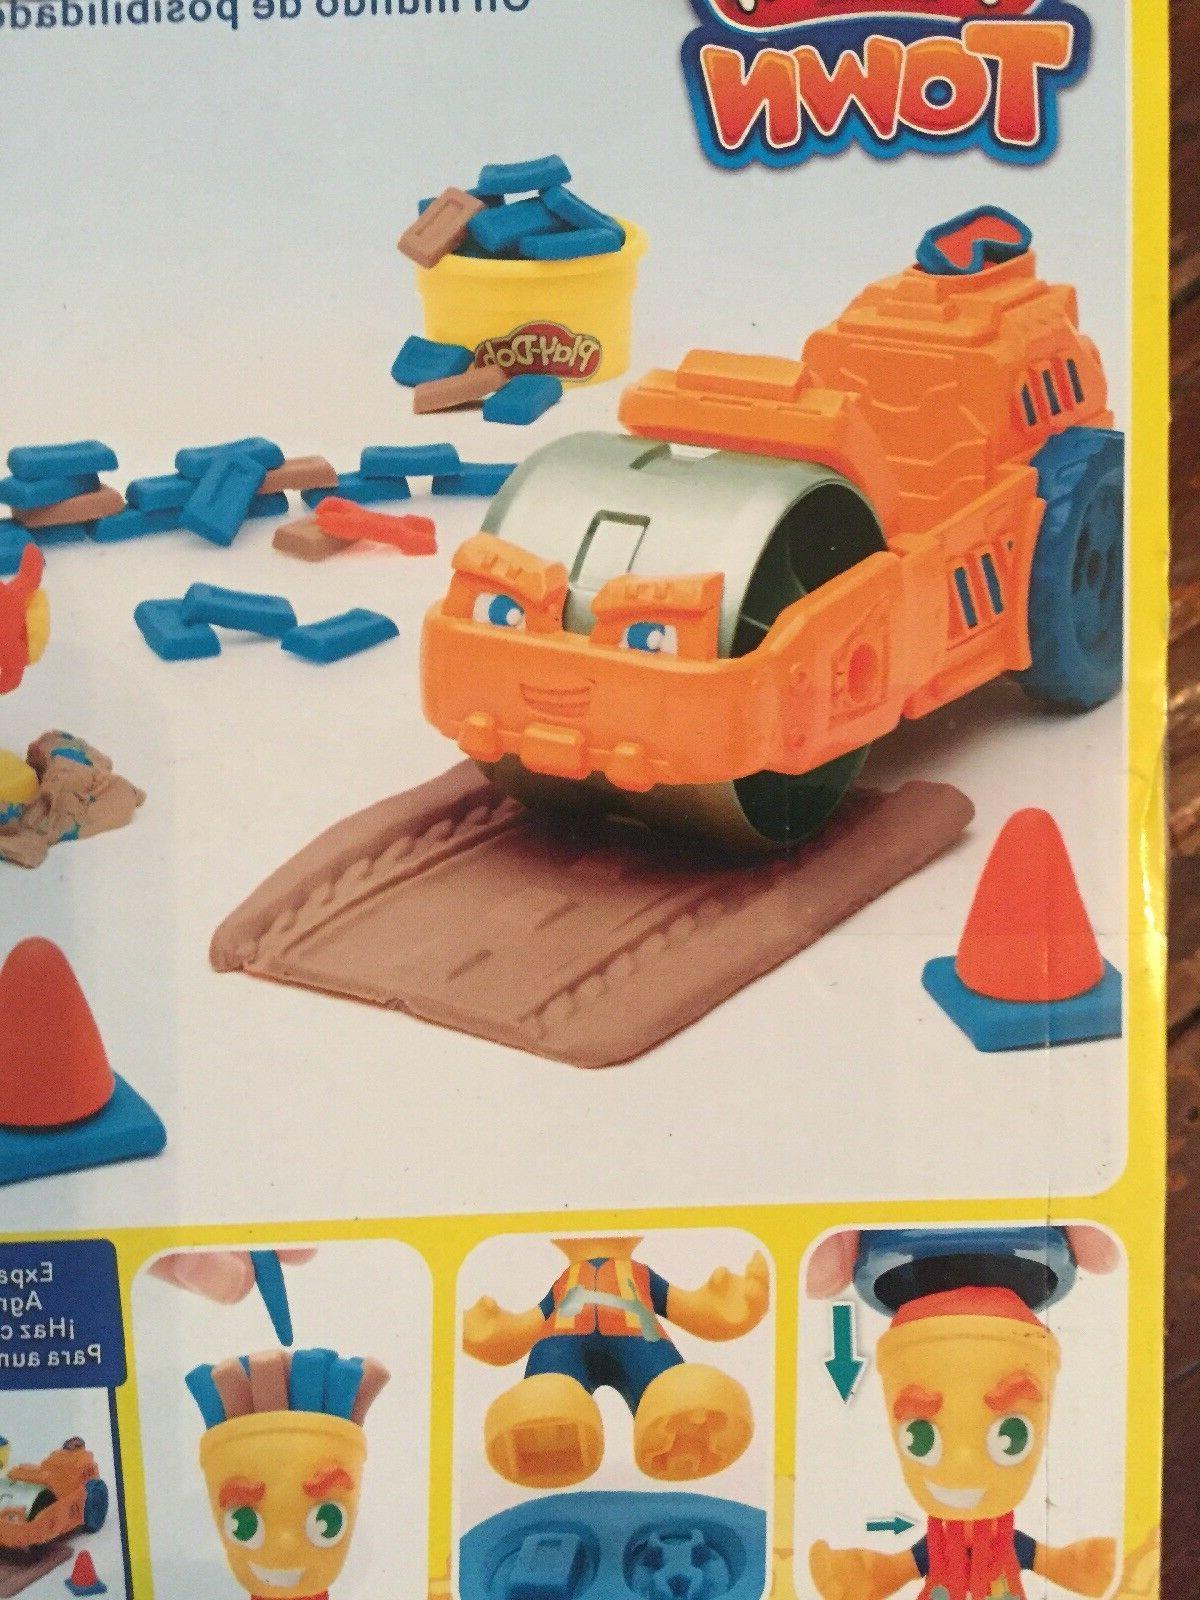 NEW Hasbro Play-Doh Play Set Person Toys